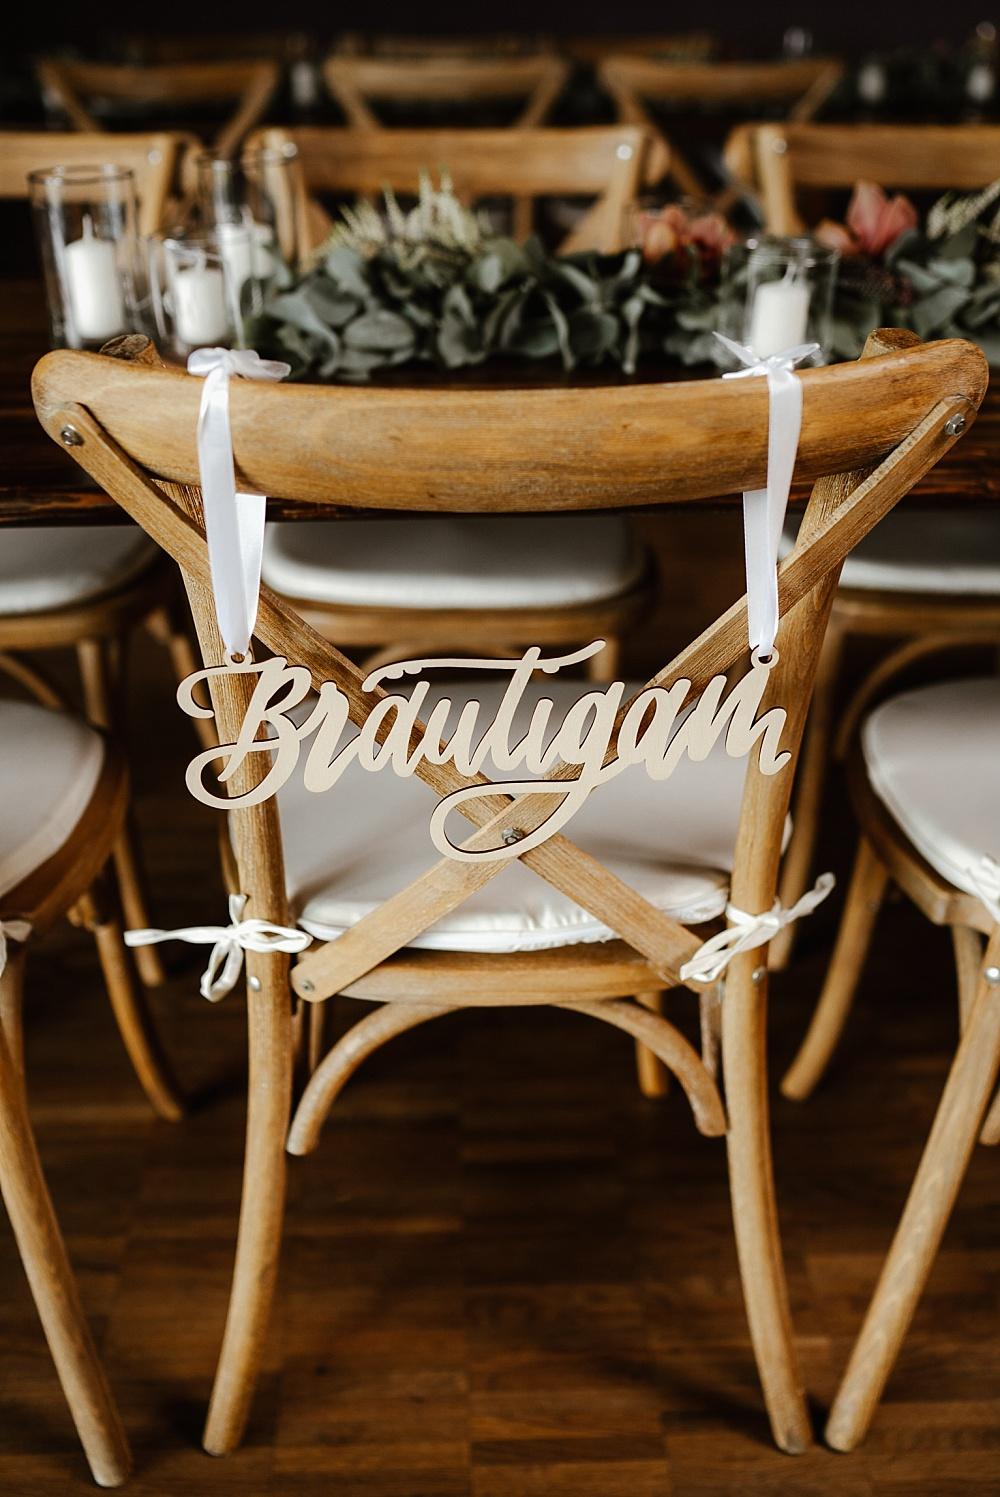 Bräutigam Stuhlschild Hochzeit, Hochzeitsschild Bräutigam, Stuhlschilder Hochzeit, Stuhlschild Hochzeit Naturholz,